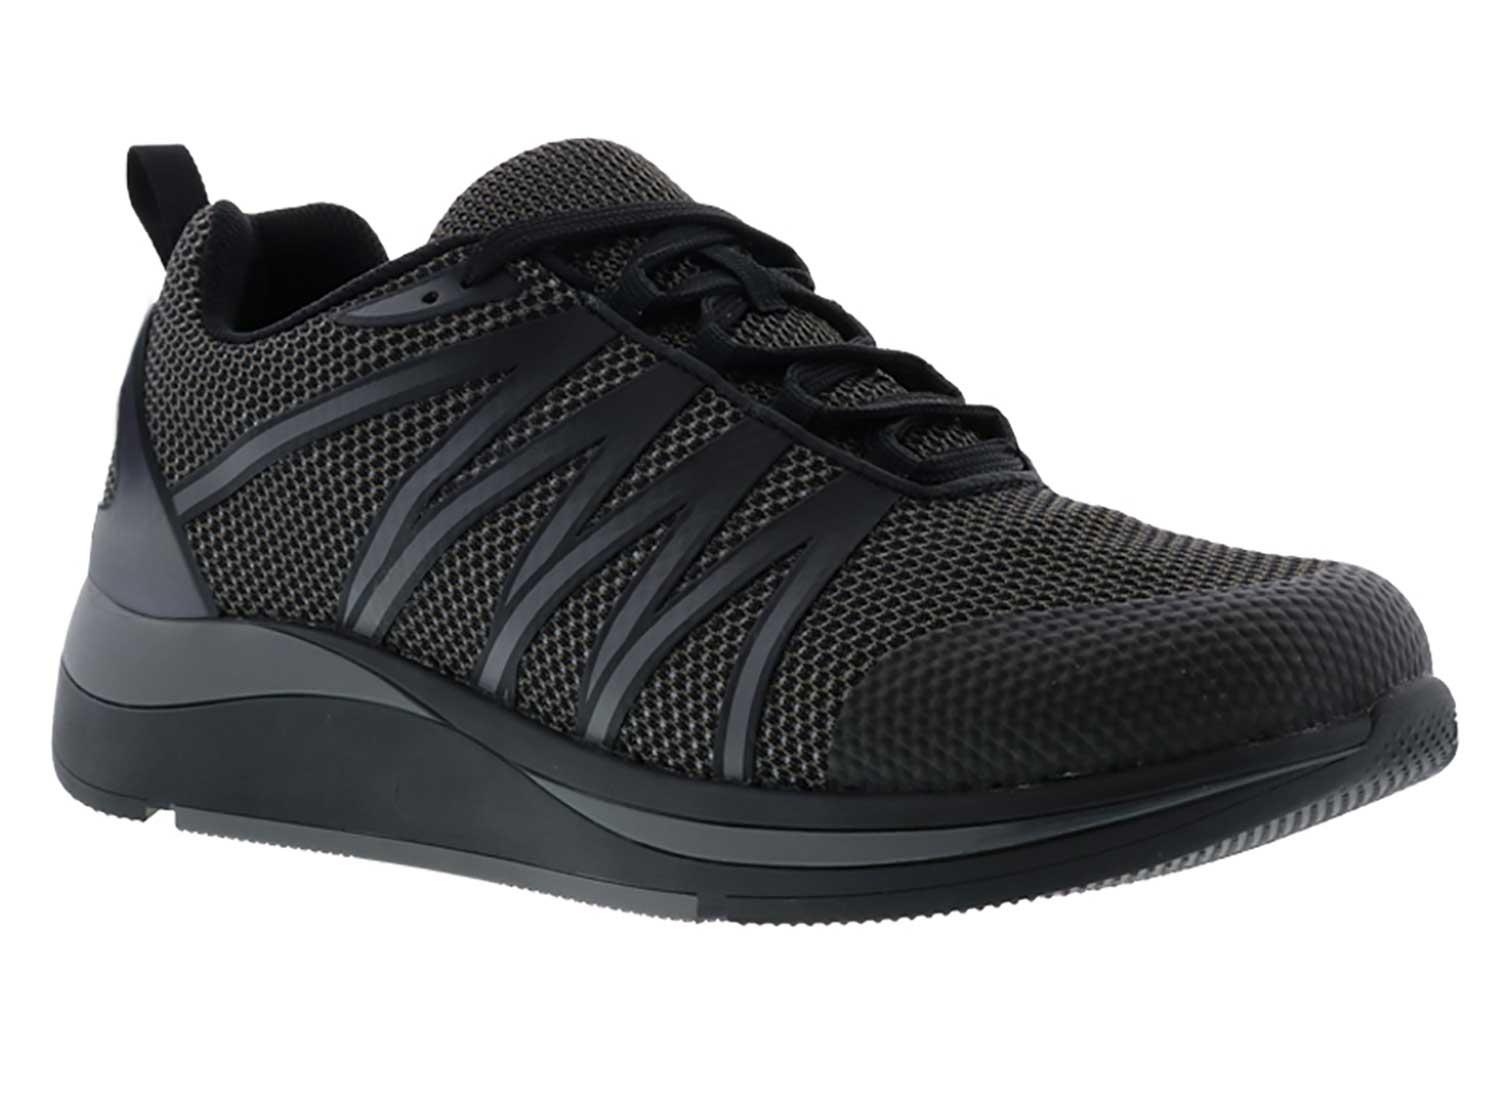 Drew Shoes Player 40105 - Men's Comfort Therapeutic Diabetic Athletic Shoe - Extra Depth for Orthotics